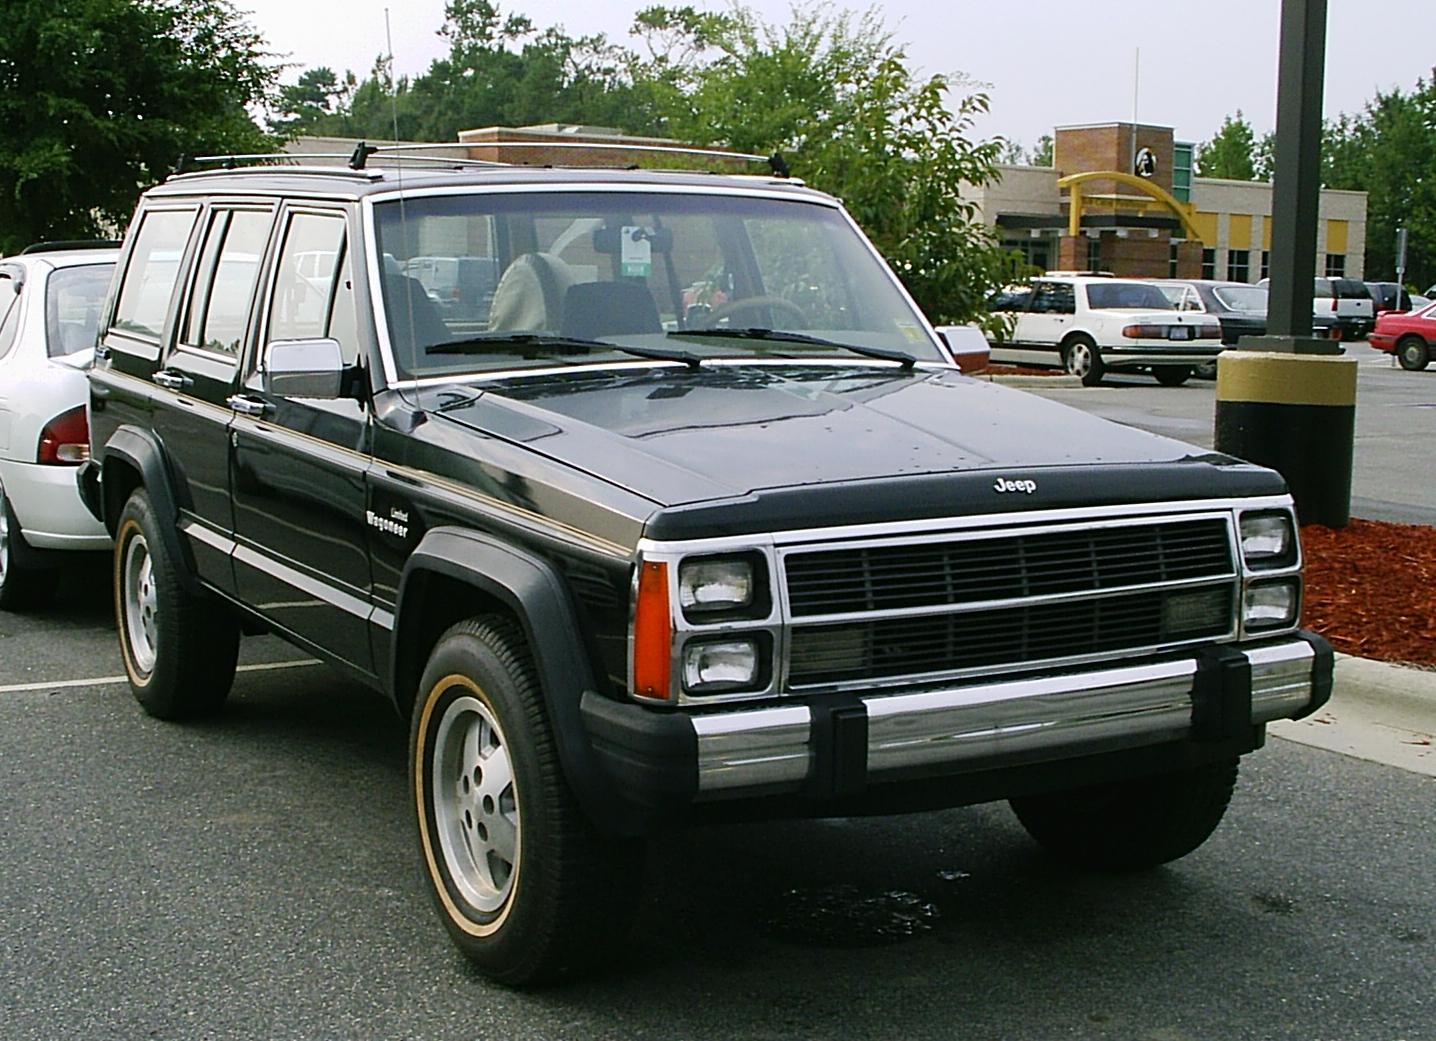 Jeep grand wagoneer wiki